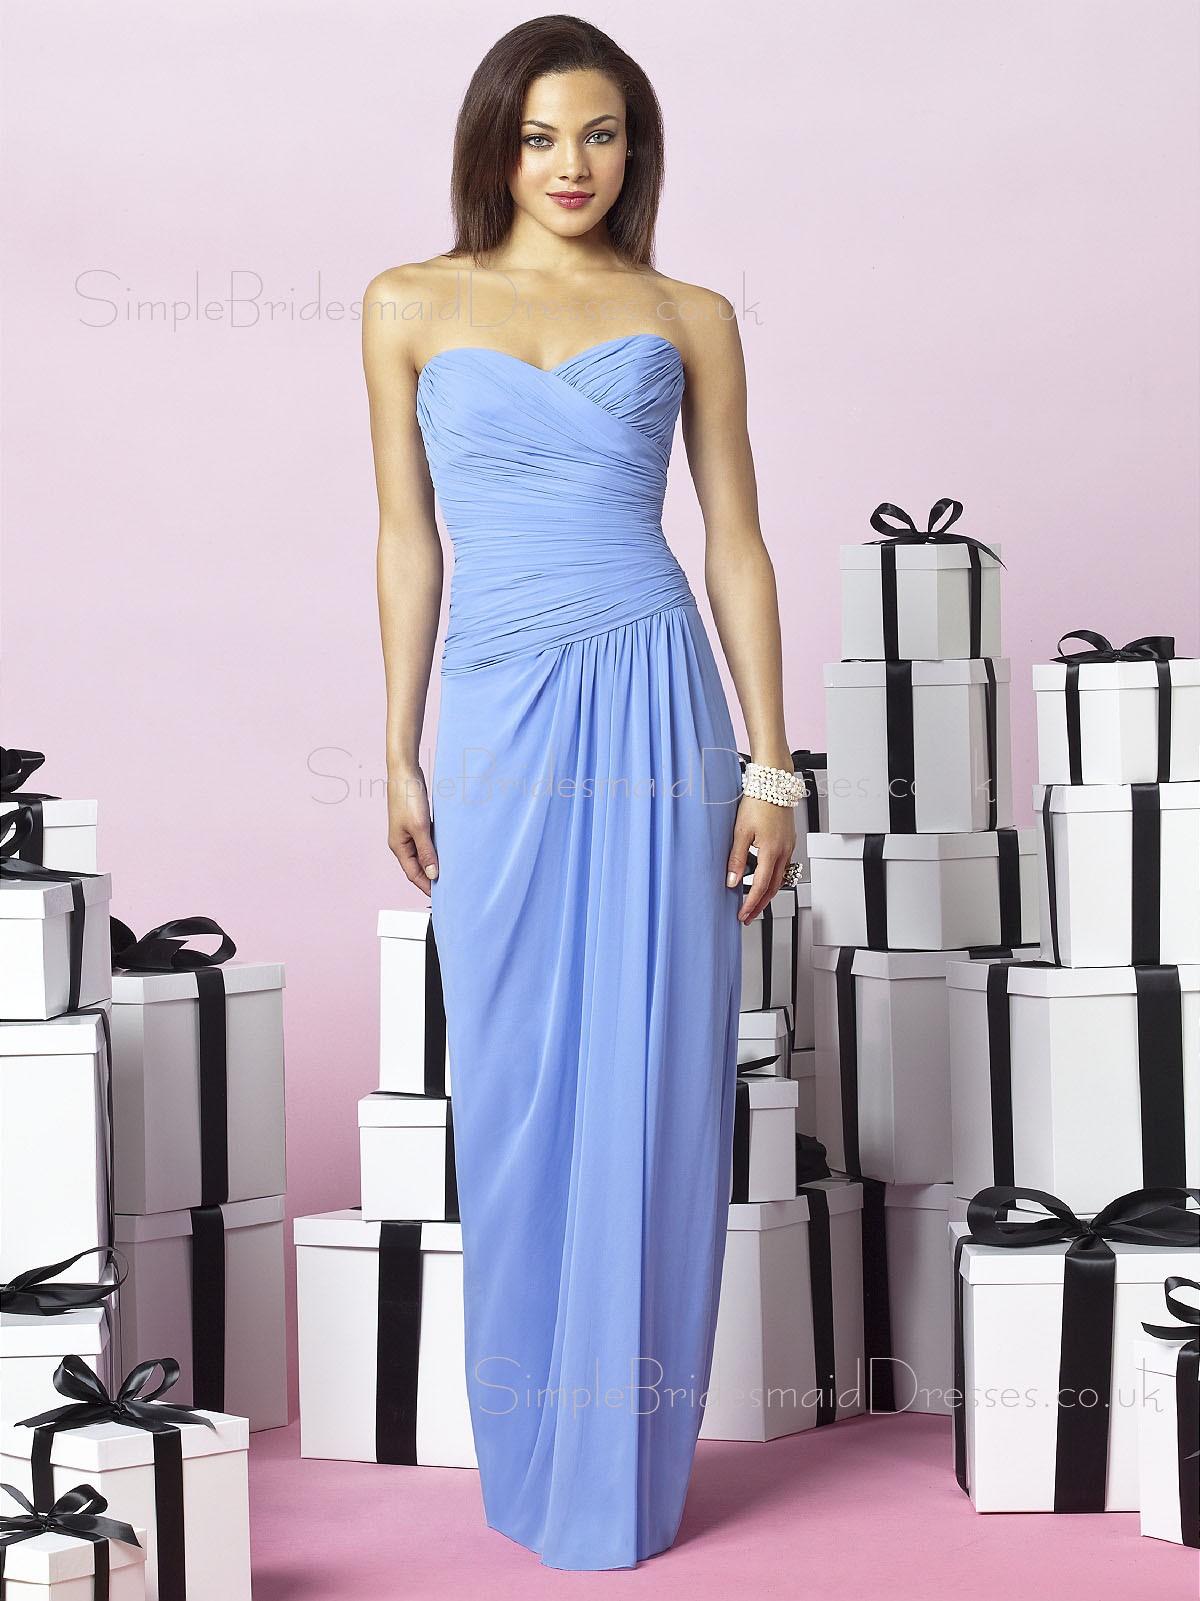 Sleeveless zipper sweetheart light sky blue floor length sleeveless zipper sweetheart light sky blue floor length bridesmaid dress ombrellifo Choice Image